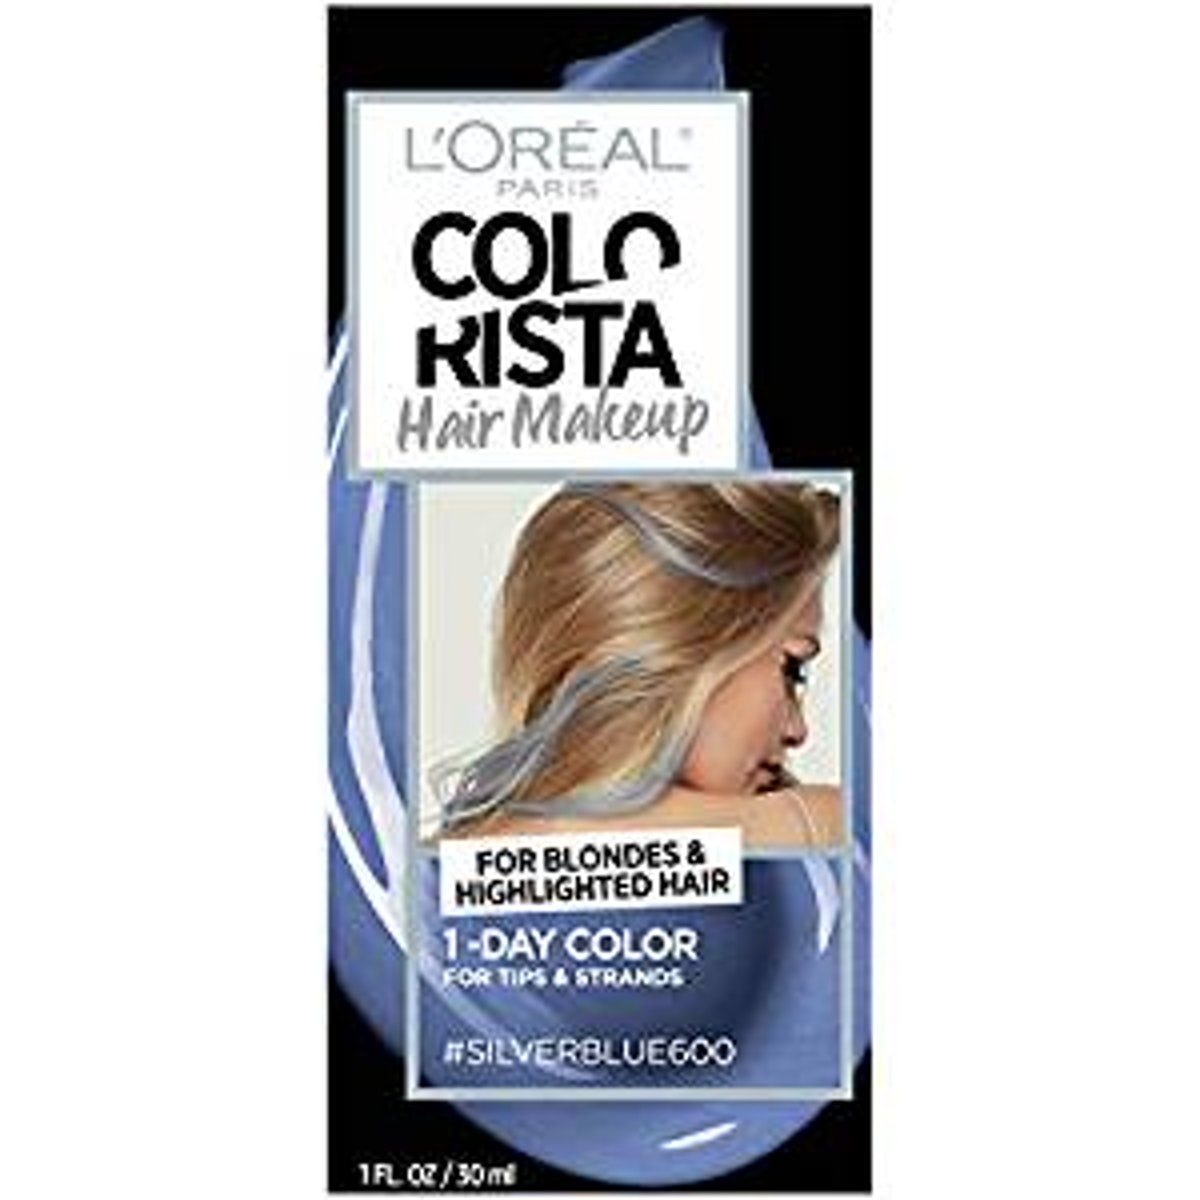 L'Oreal Paris Colorista Hair Makeup in Silver Blue